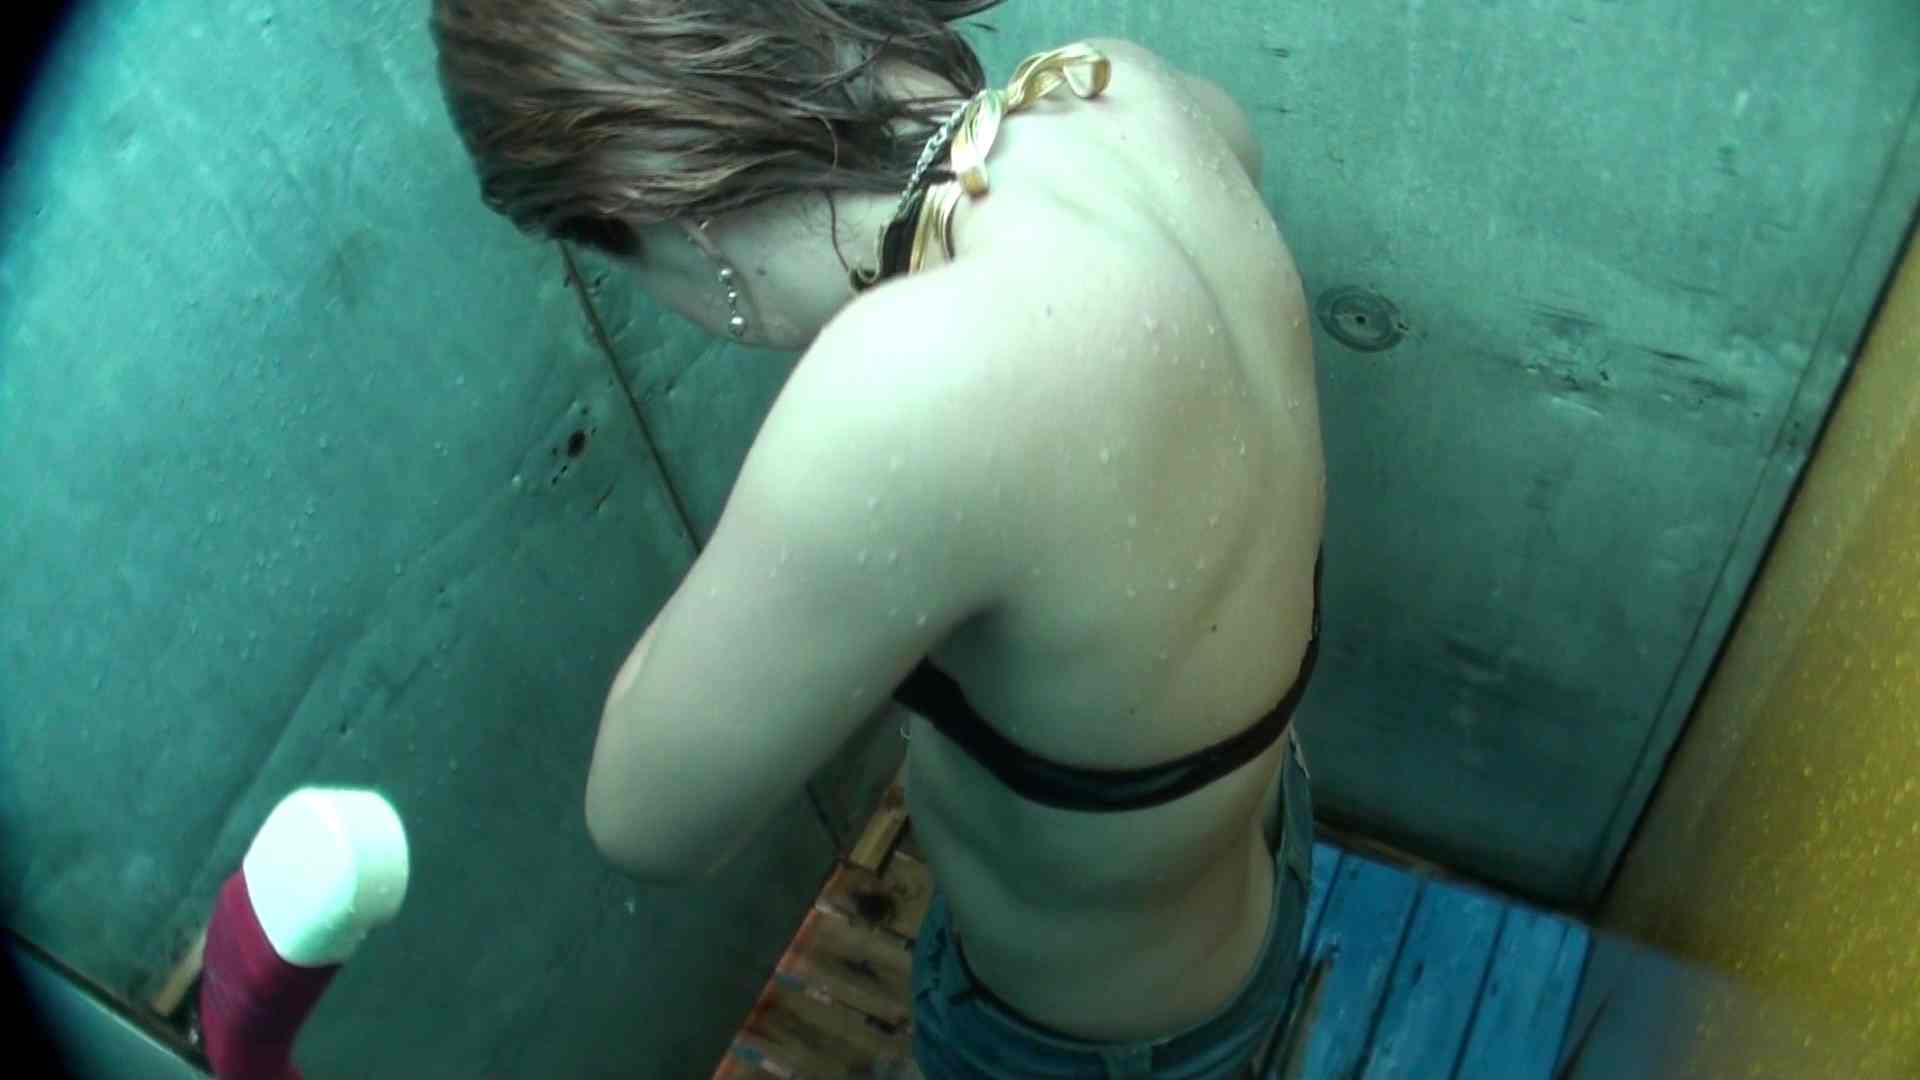 Vol.19 顔だけ太った宇多田ヒカルのジラしのちら見せ シャワー | 高画質  81枚 19